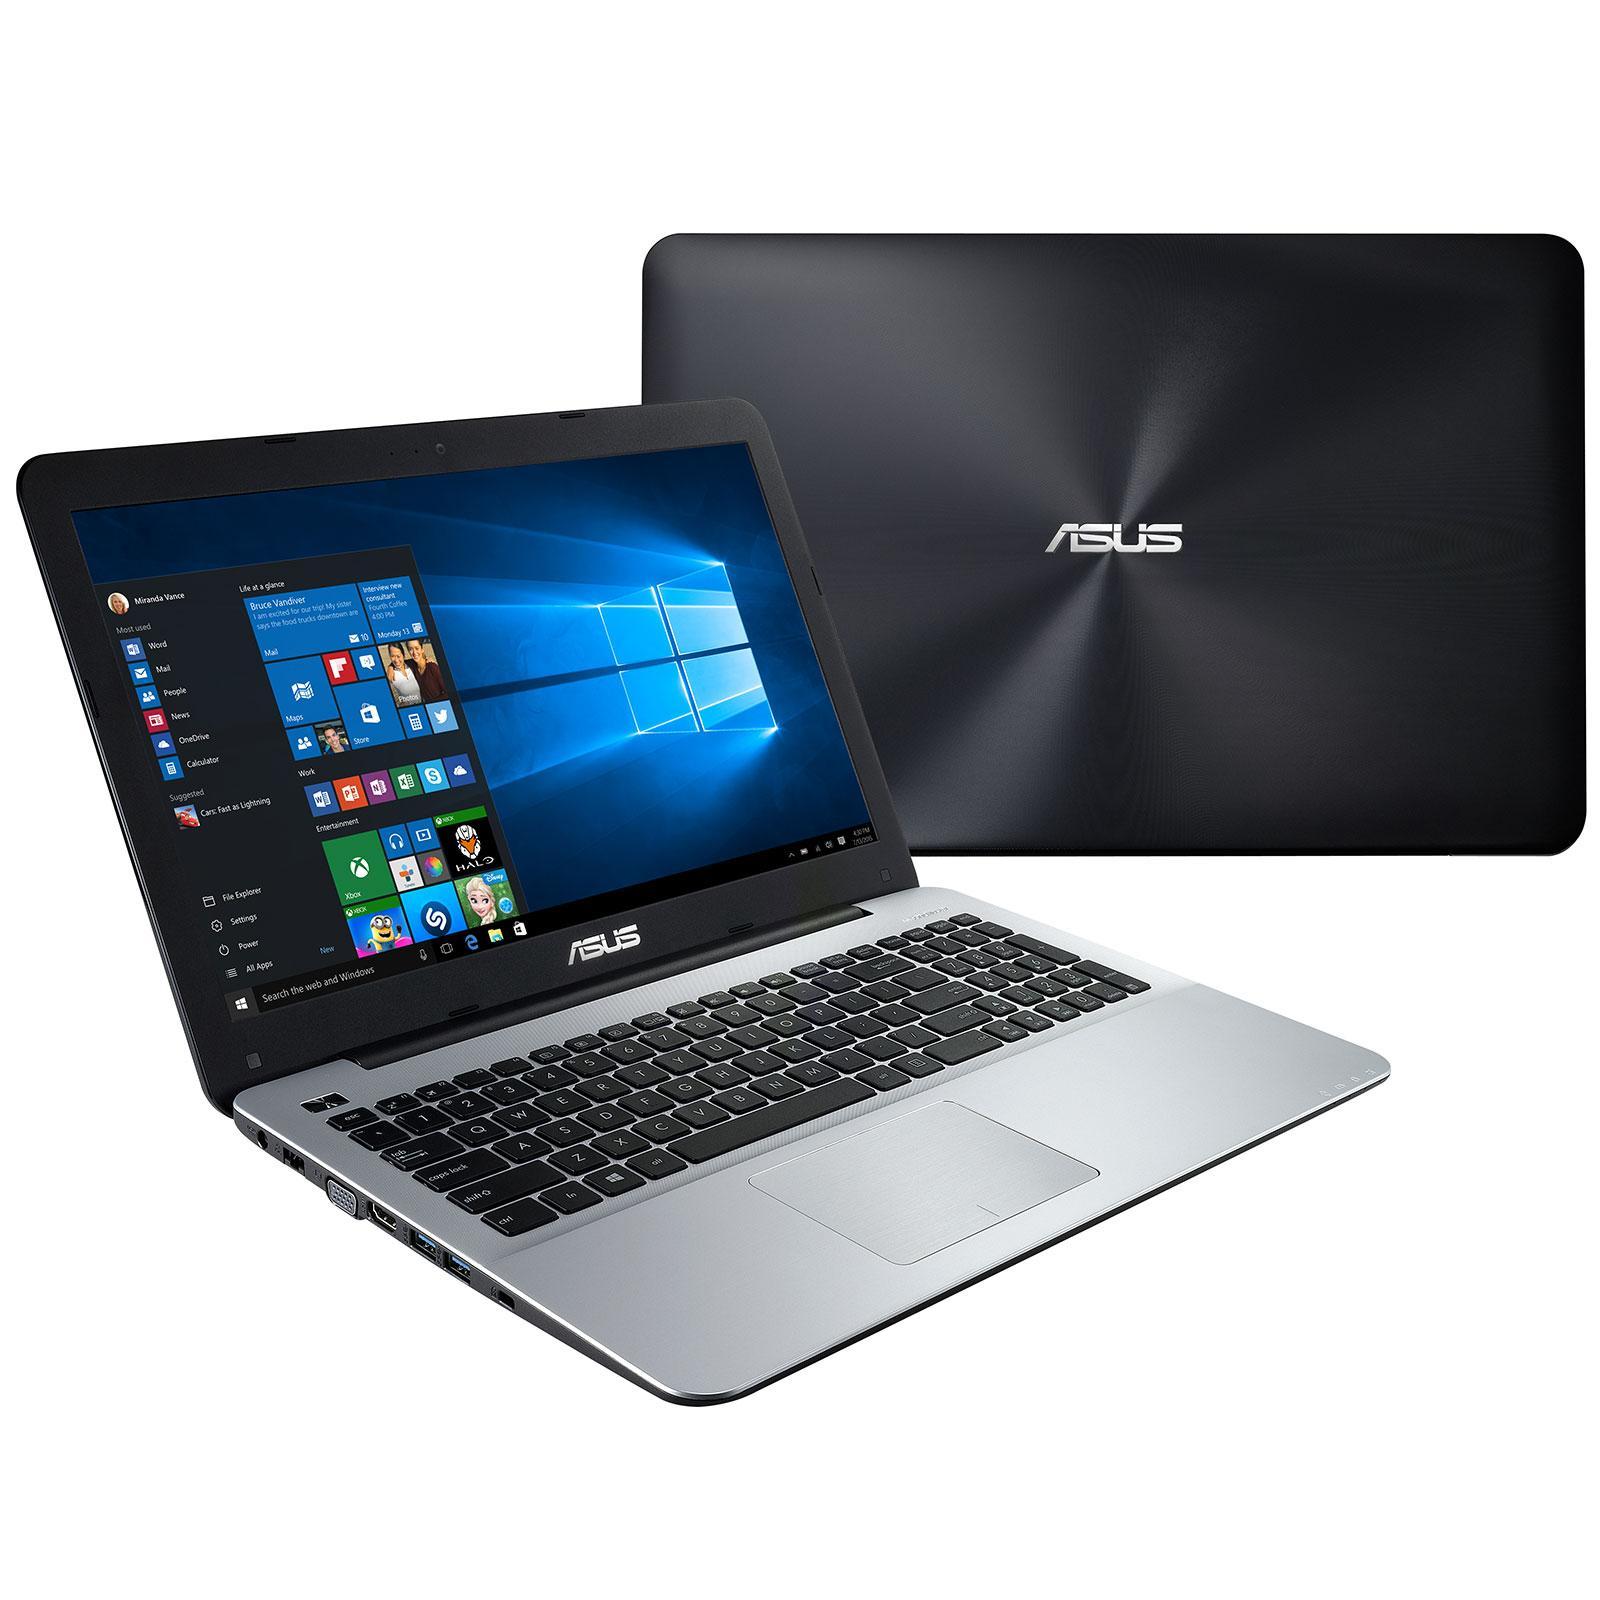 "PC Portable 15.6"" Asus R556UJ-DM191T (i5 6200U - 6 Go RAM - 128Go SSD - 920M)"